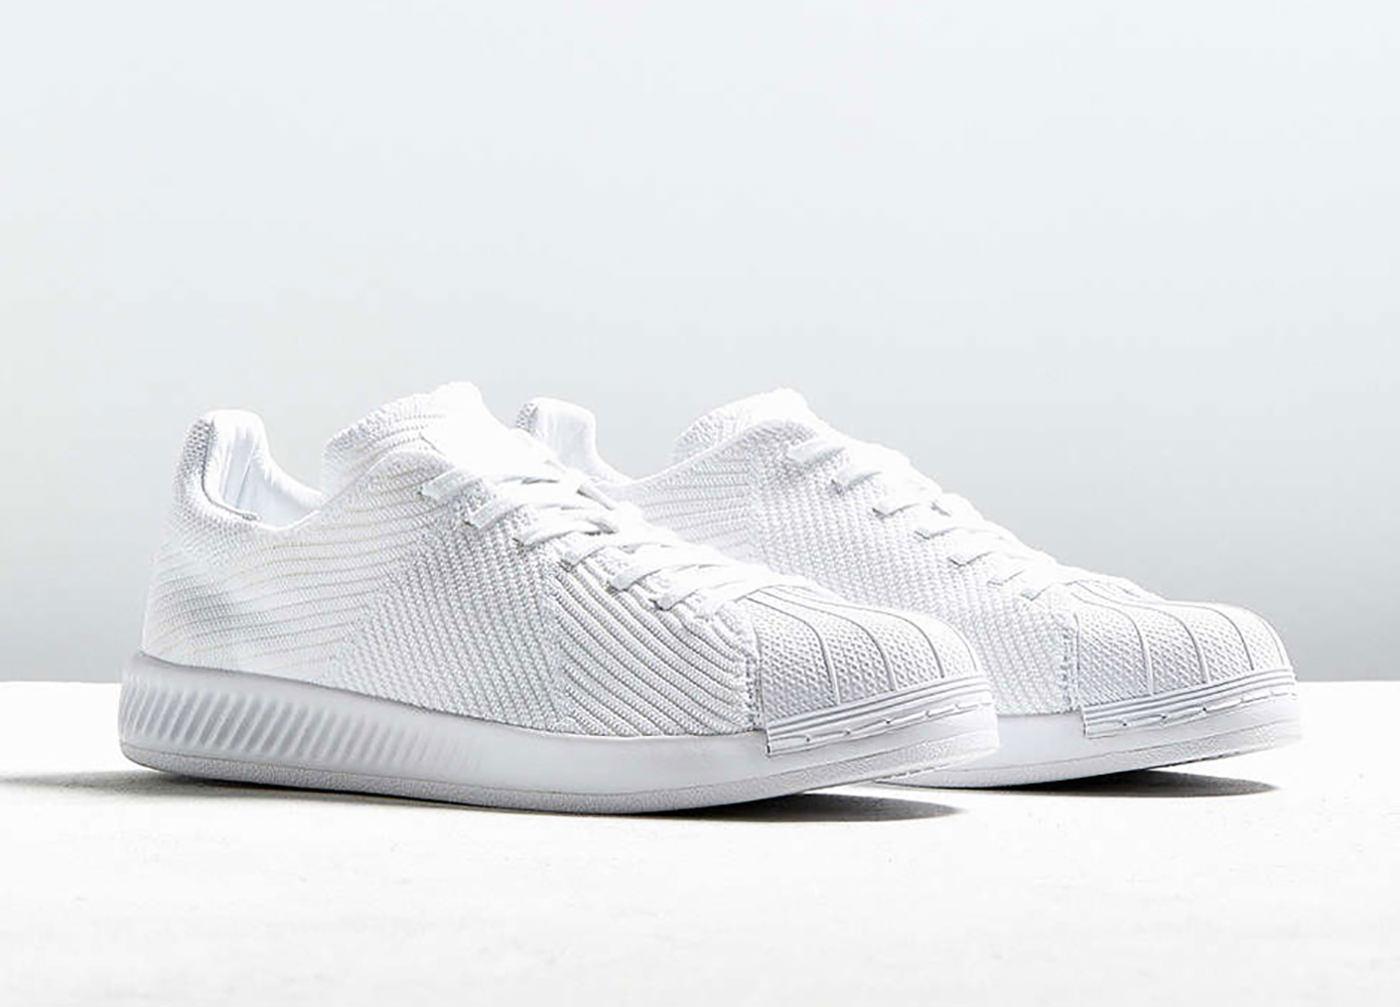 adidas-superstar-primeknit-1